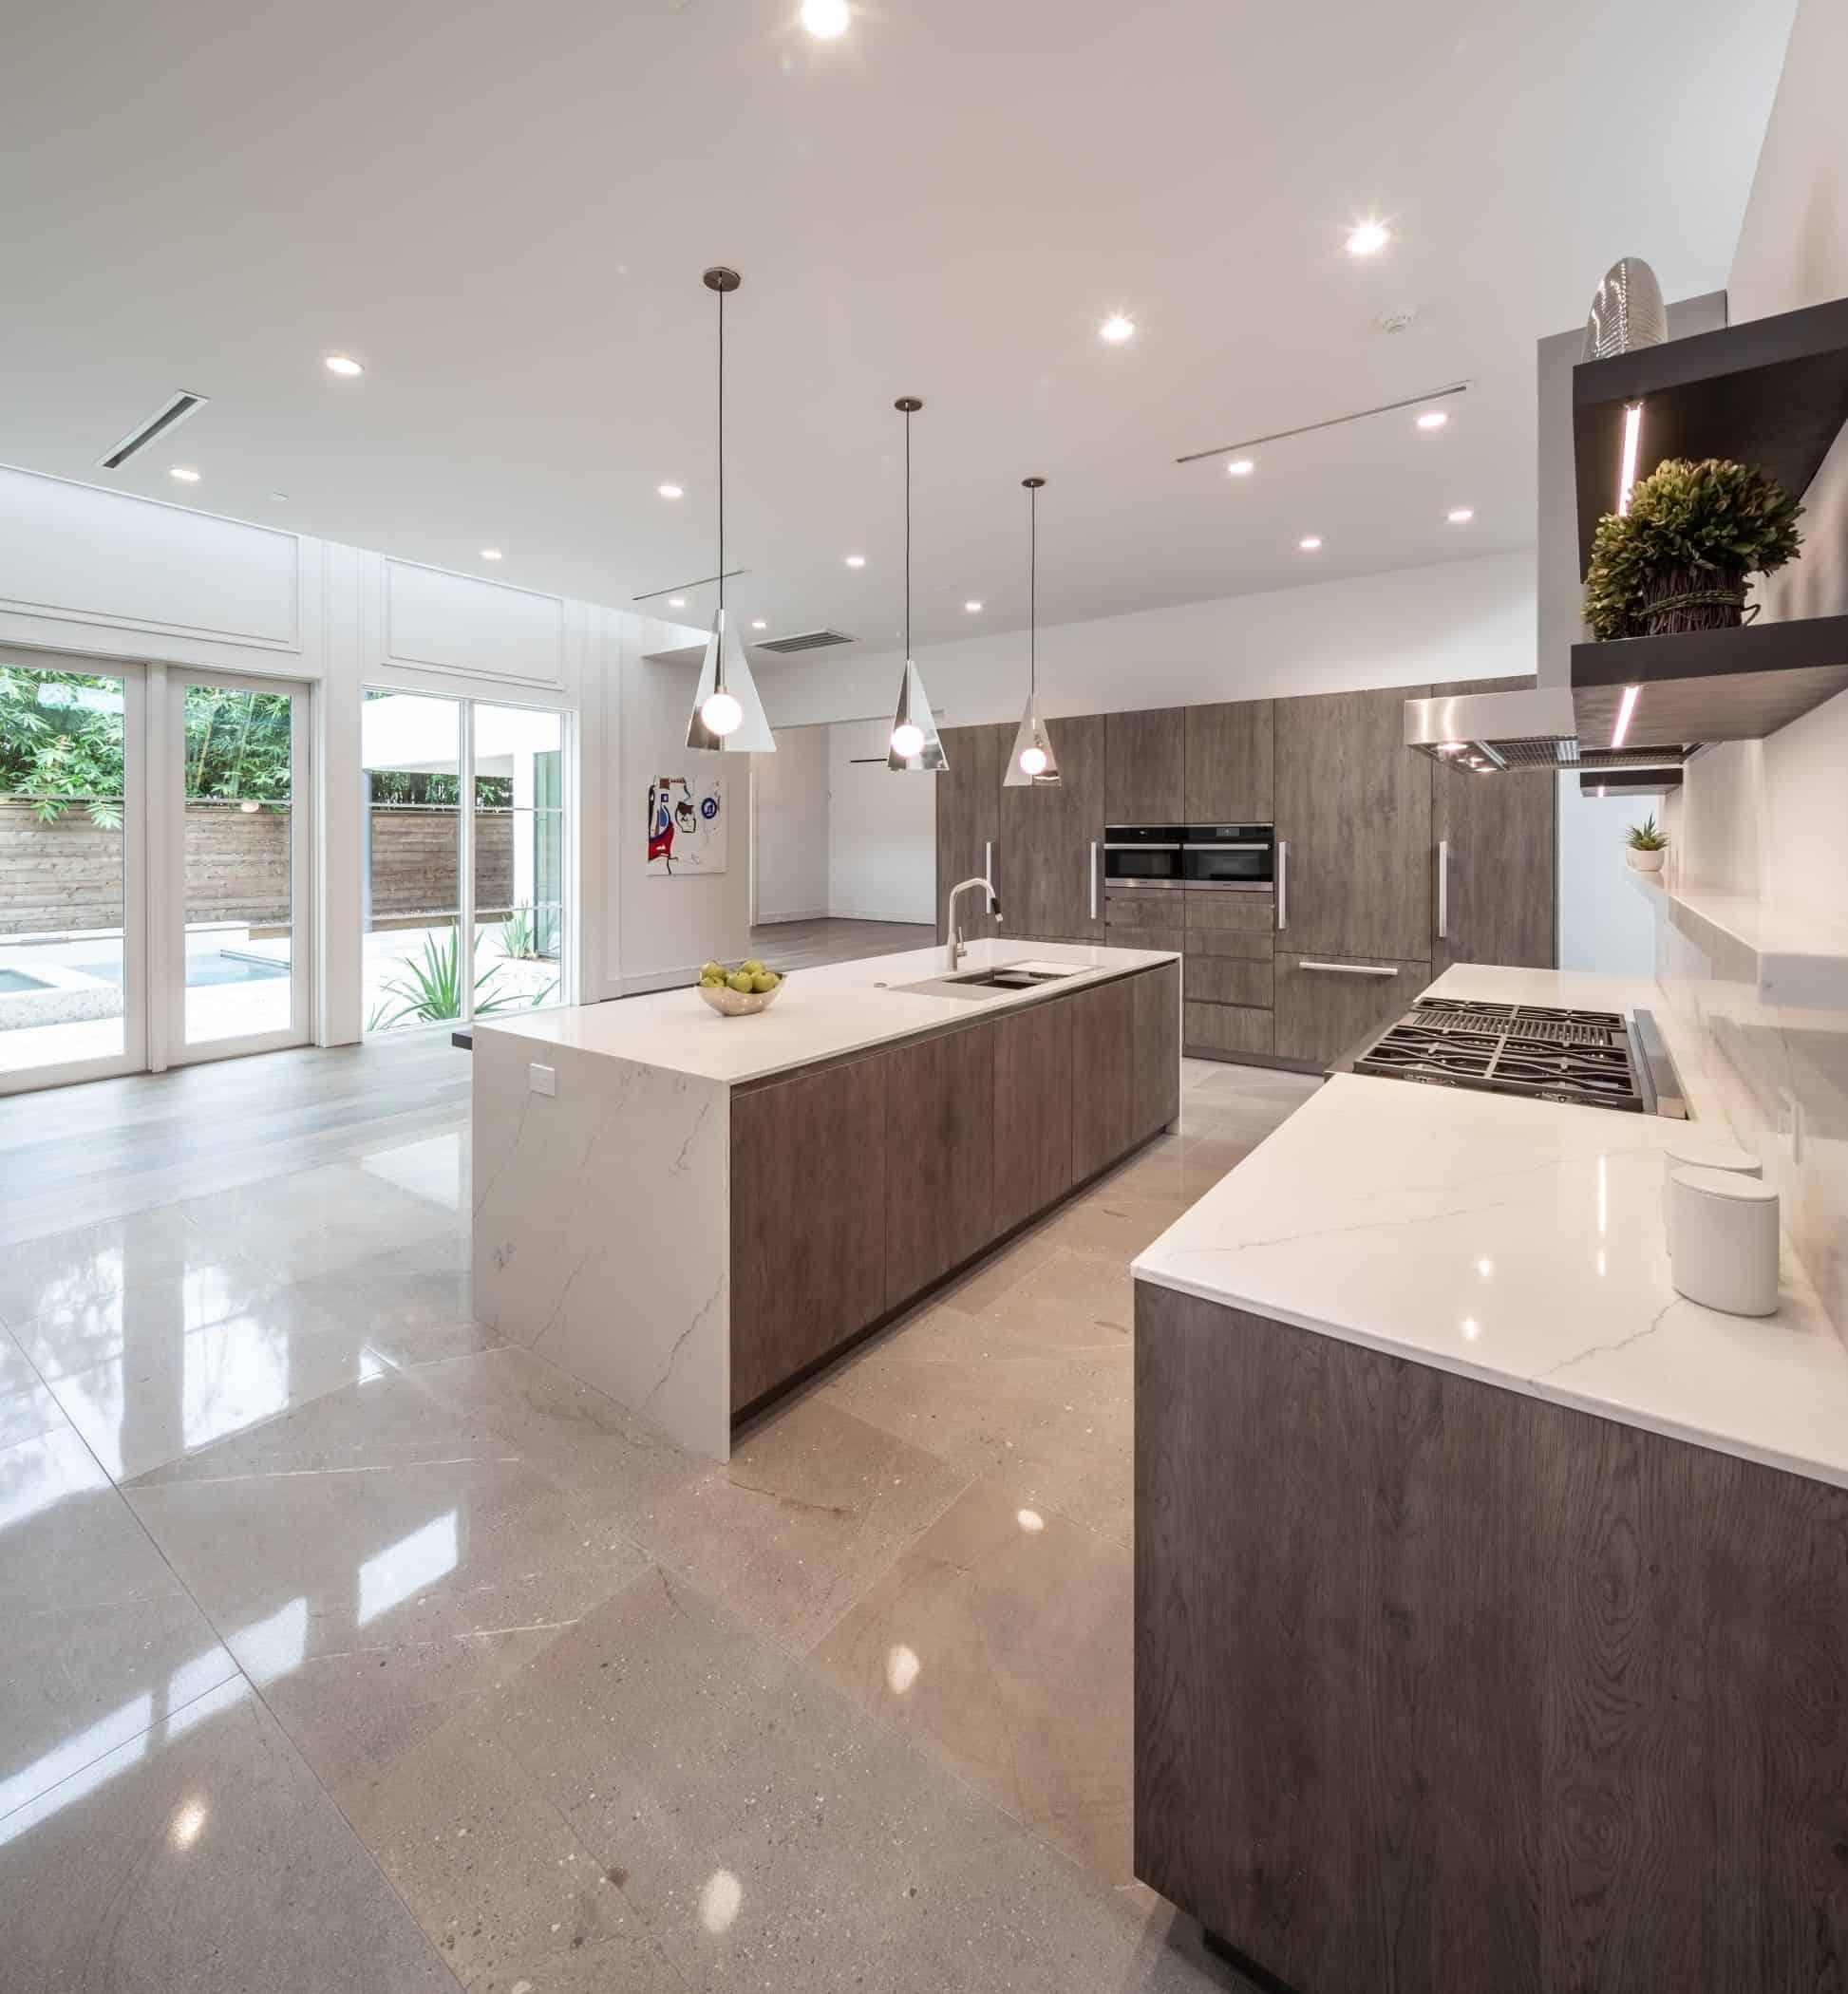 ultra modern kitchen by eggersman in a washington coalition memorial park area home in houston